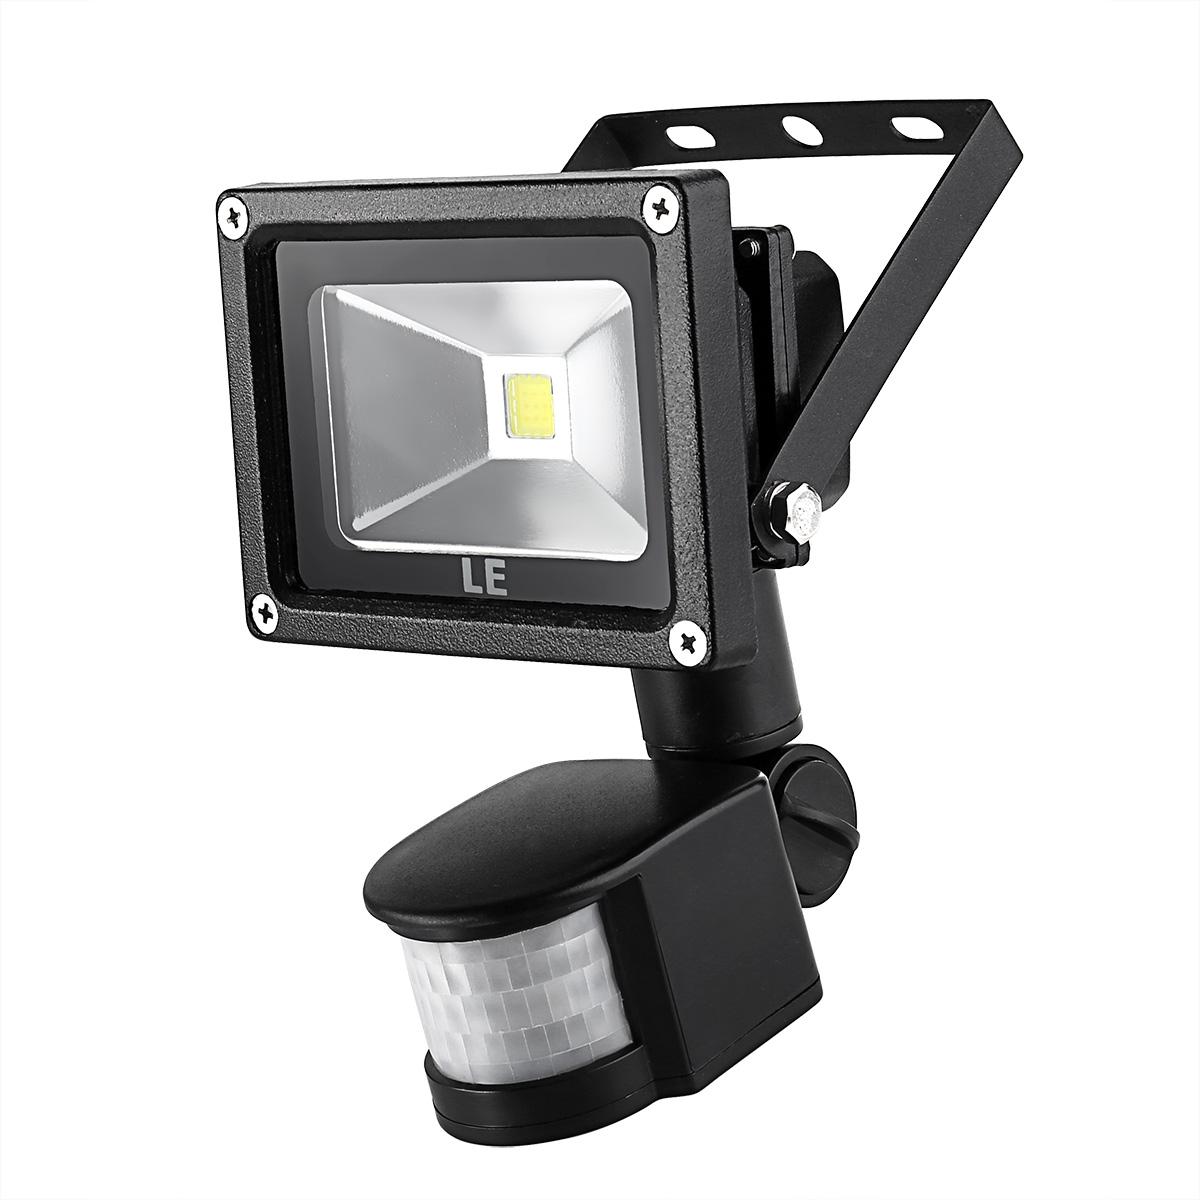 hight resolution of 10w led floodlight with pir sensor daylight white waterproof le 10w led flood light wiring diagram